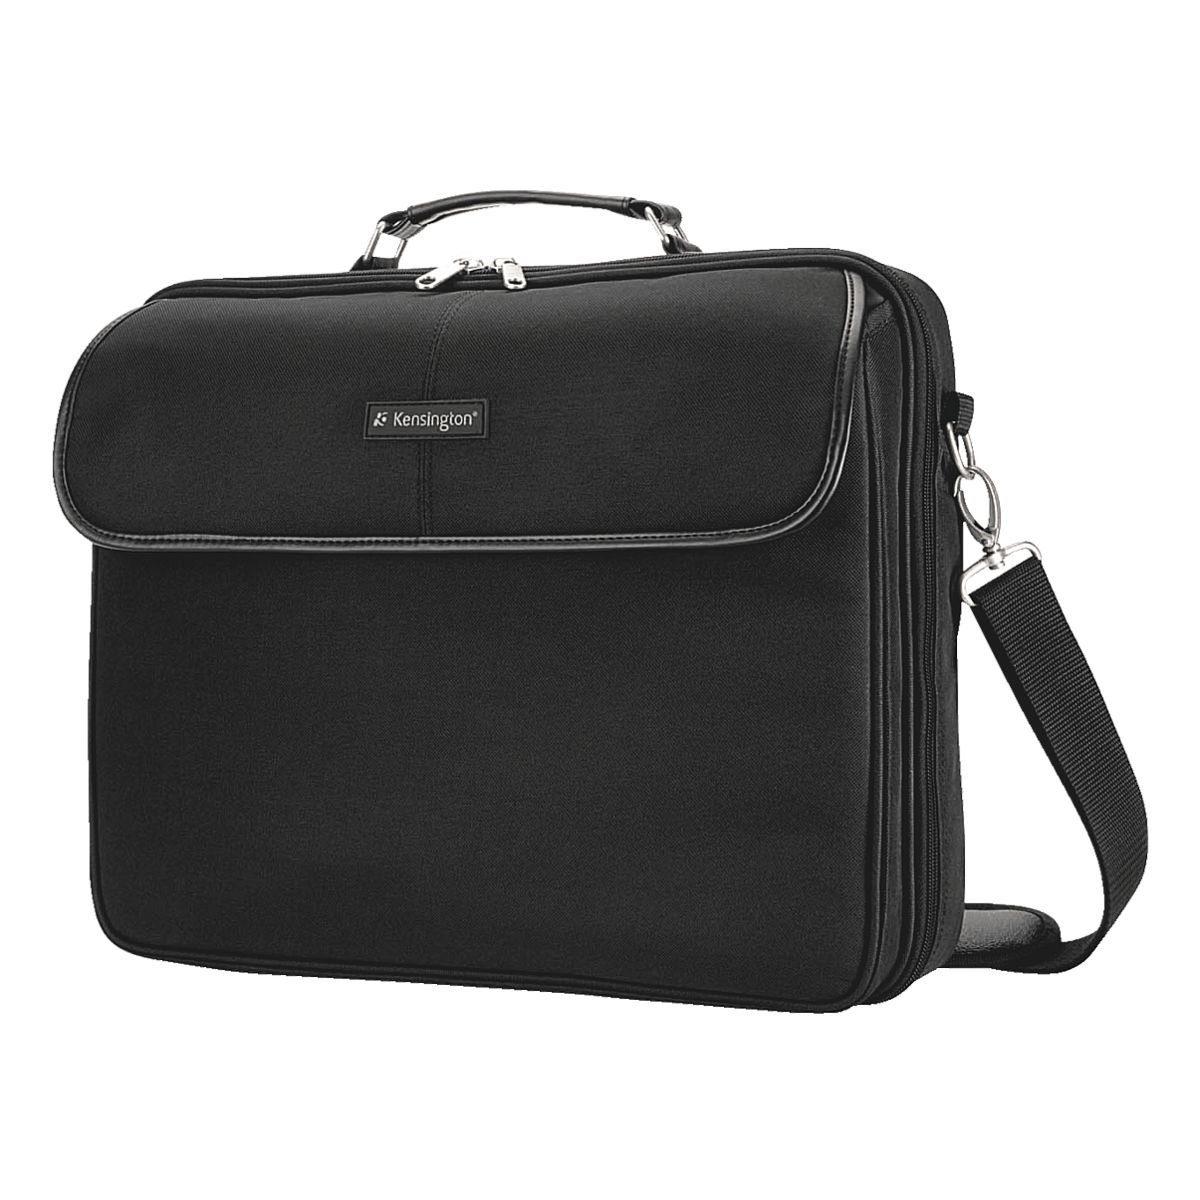 KENSINGTON Laptoptasche »SP30«